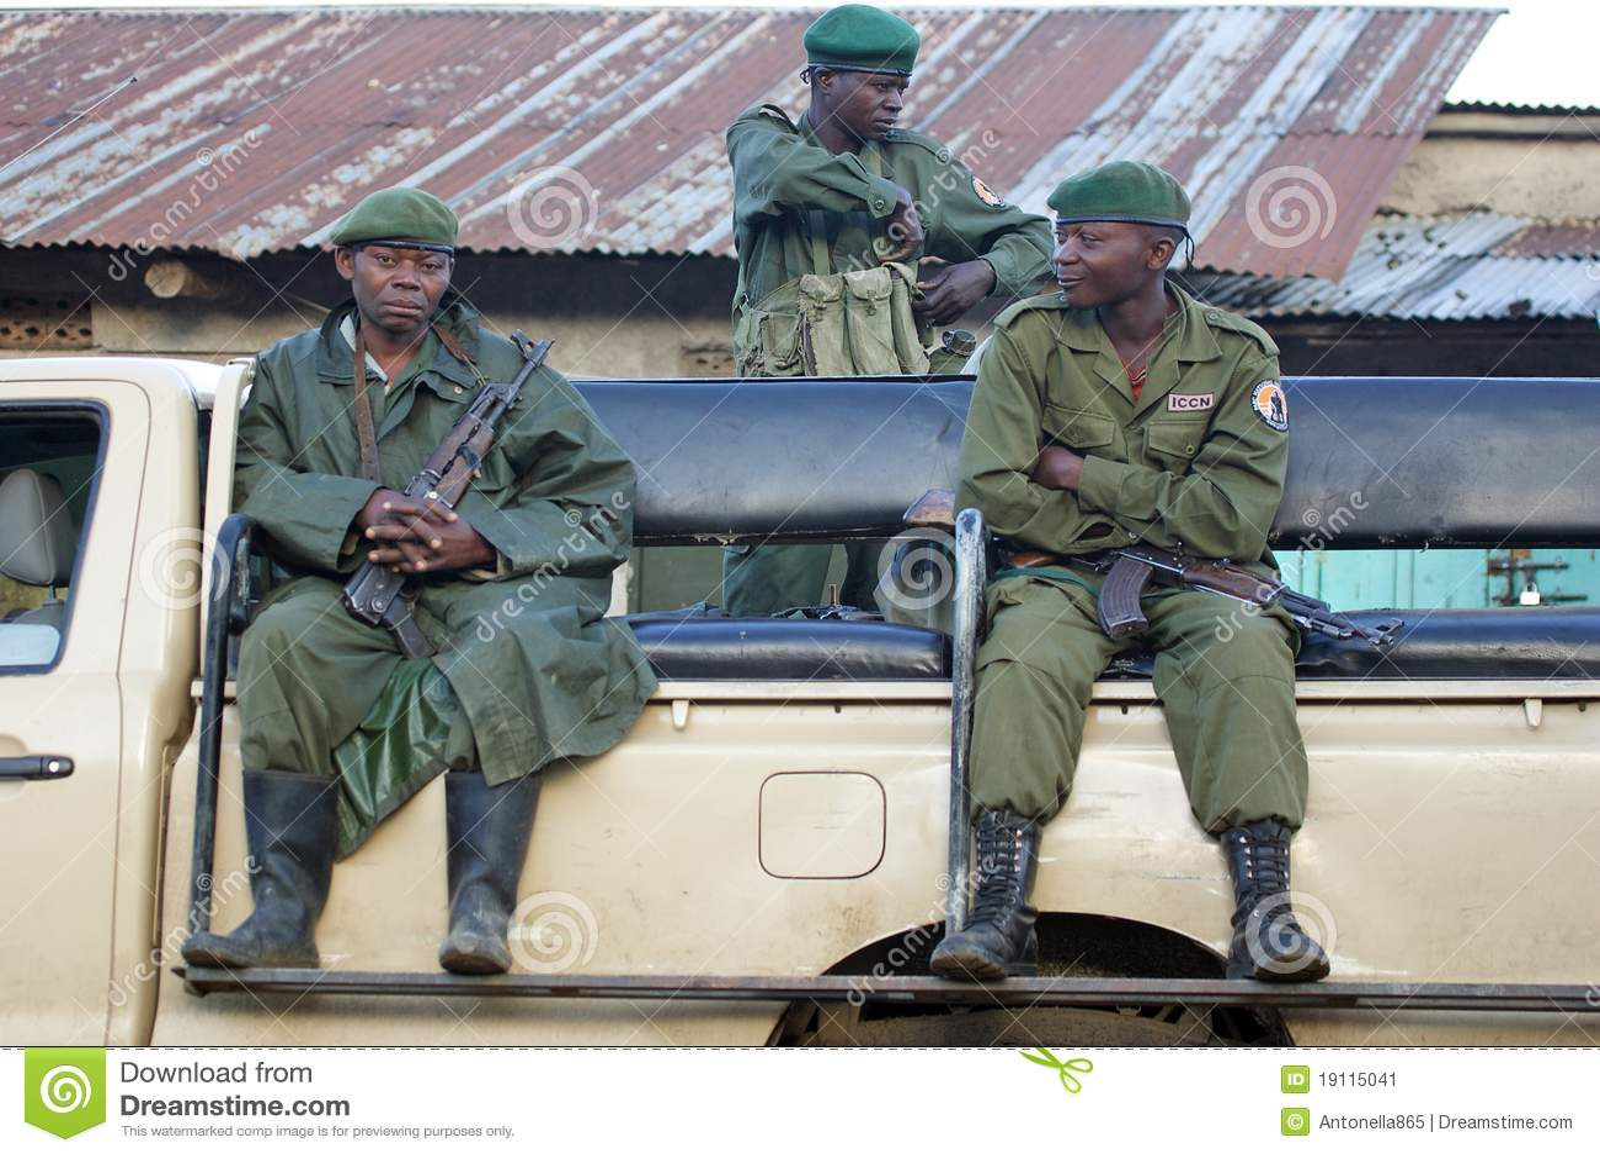 Democratic Republic of the Congo Kivu conflict